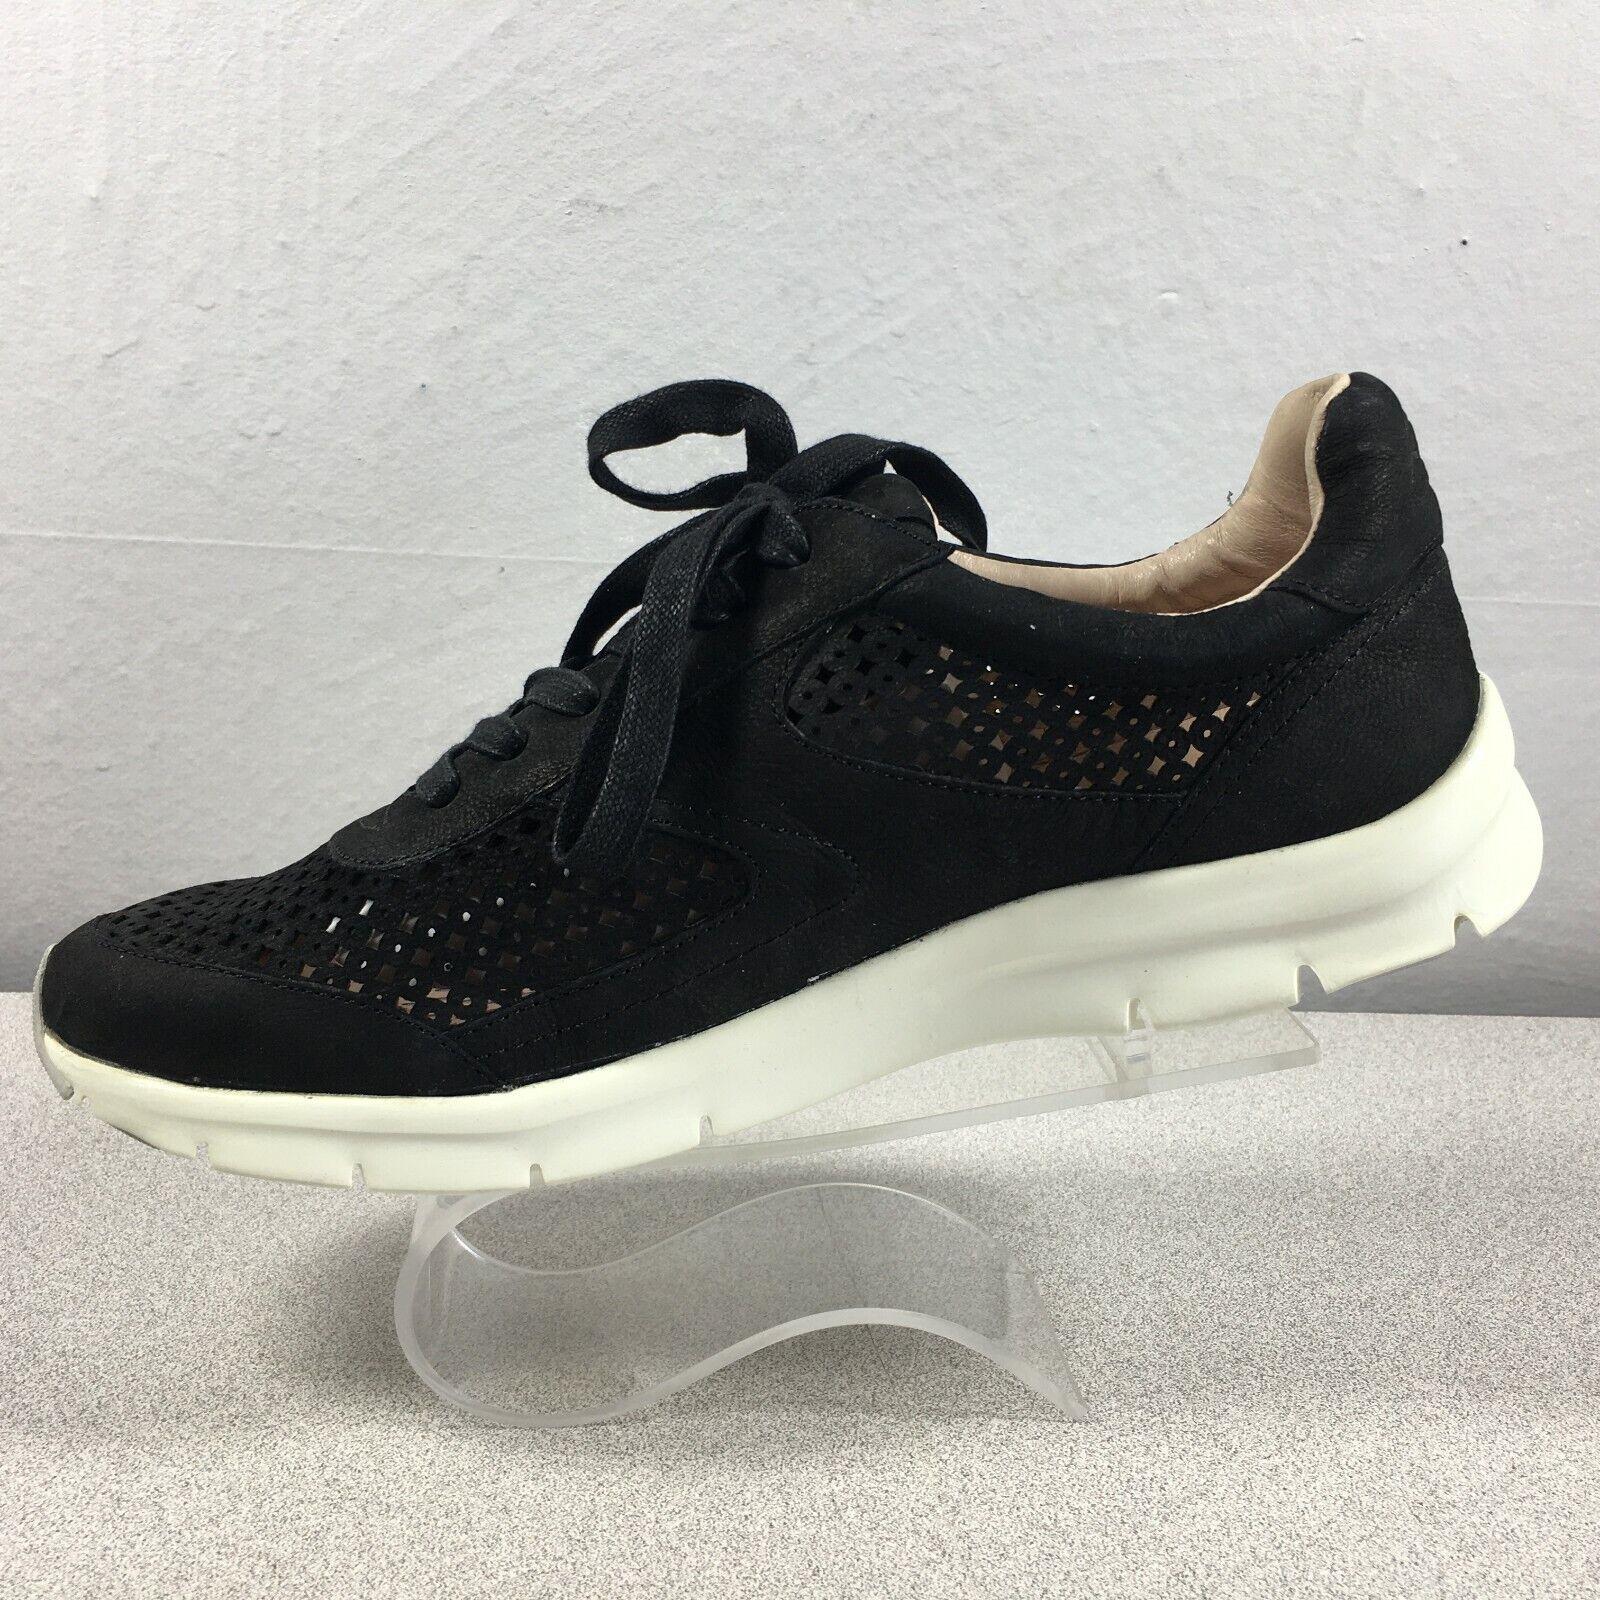 Sudini Tammi Fashion Sneaker Comfort Shoes Laser Cut Black Suede Size Womens 8 M